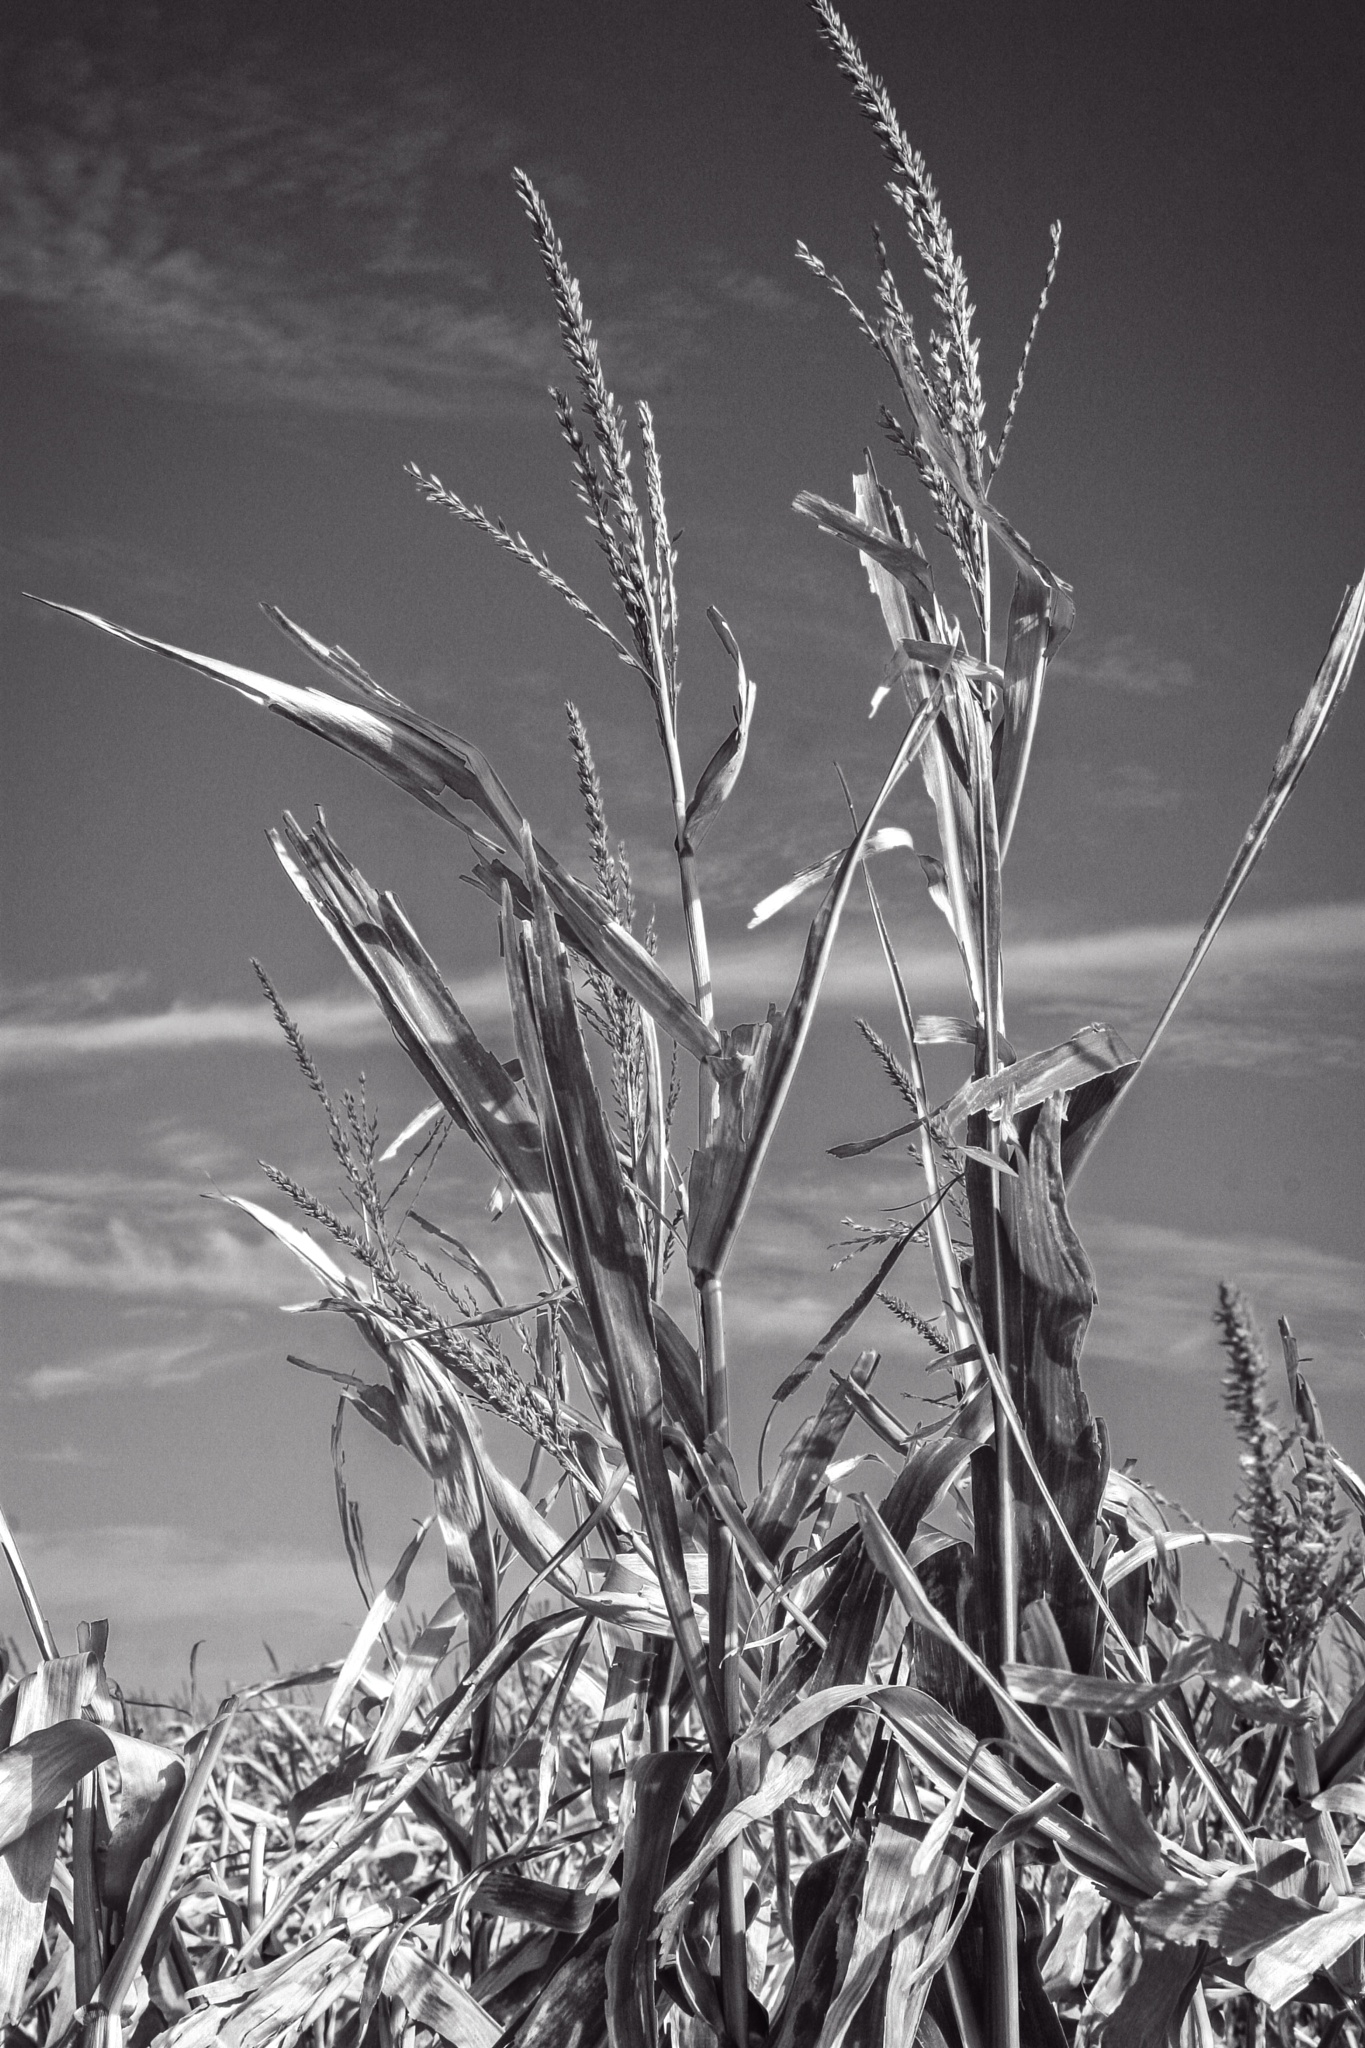 Corn nearing harvest by Jim Talbert